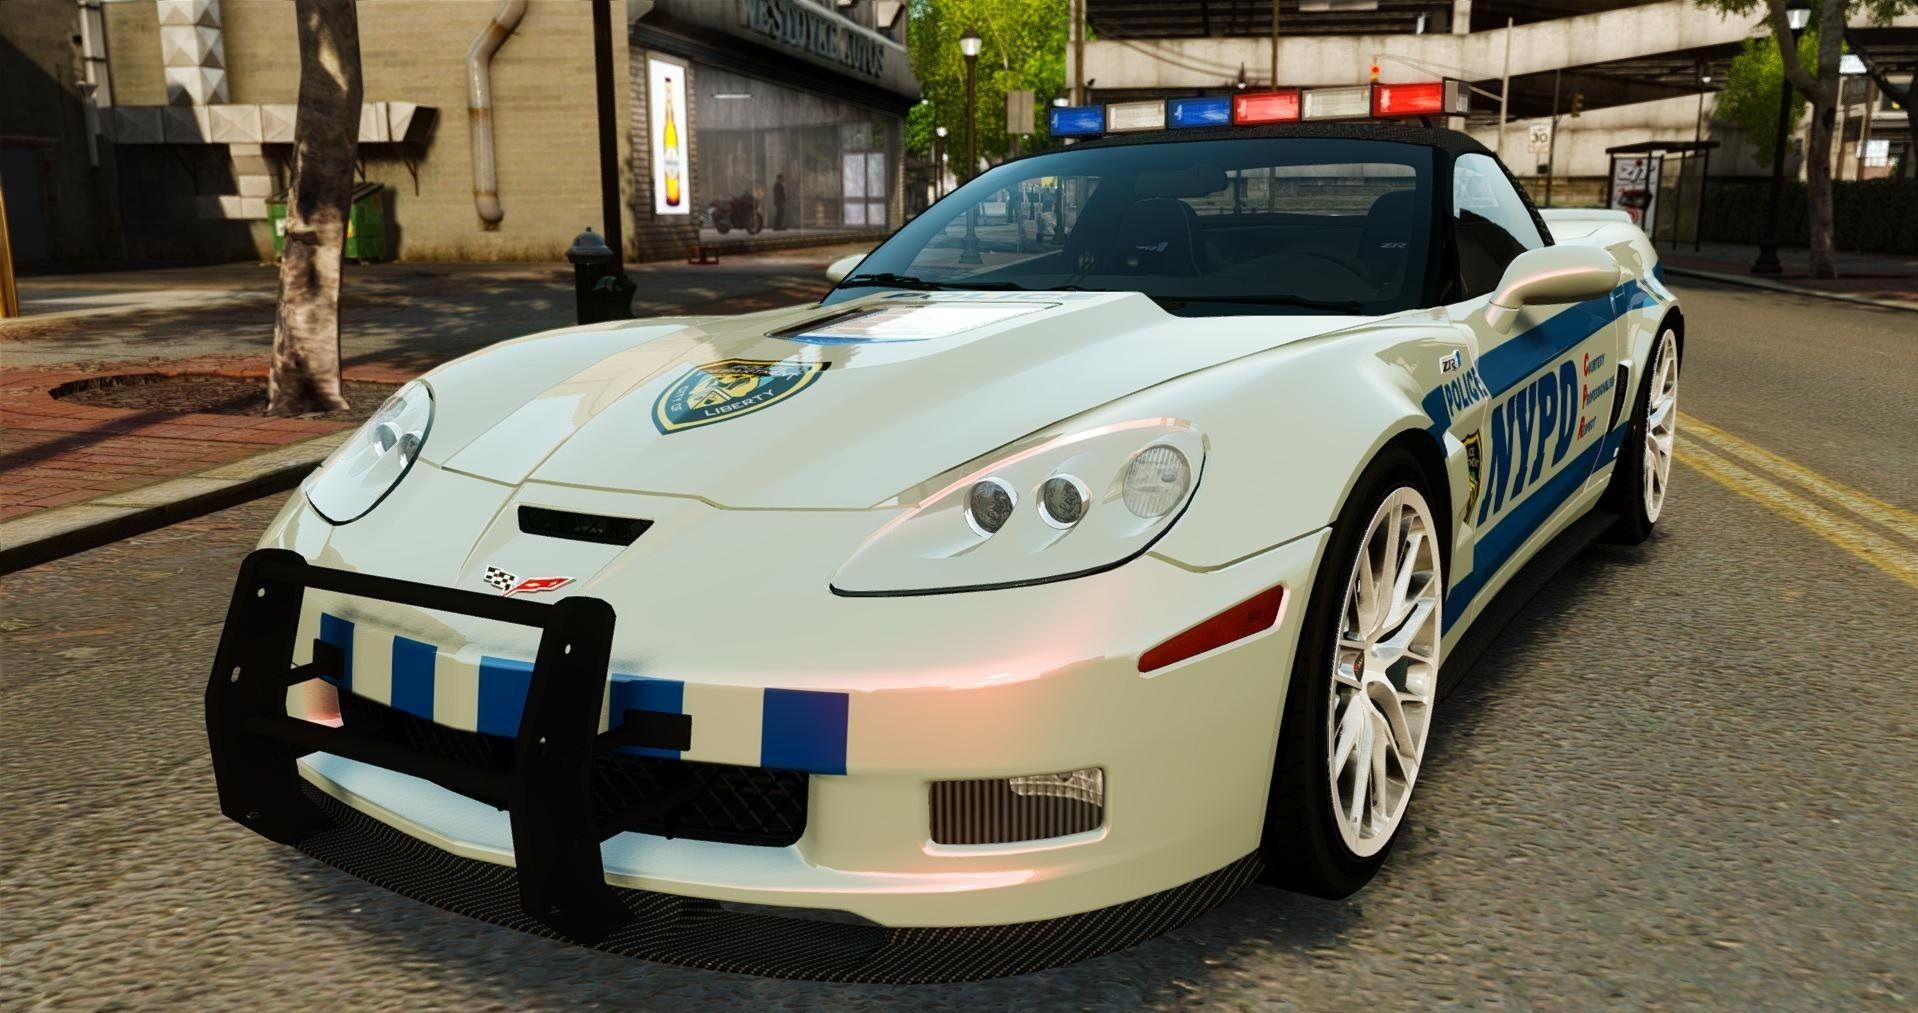 Corvette Police Car: Chevrolet Corvette Zr1 Gt5 Police Car Modifications